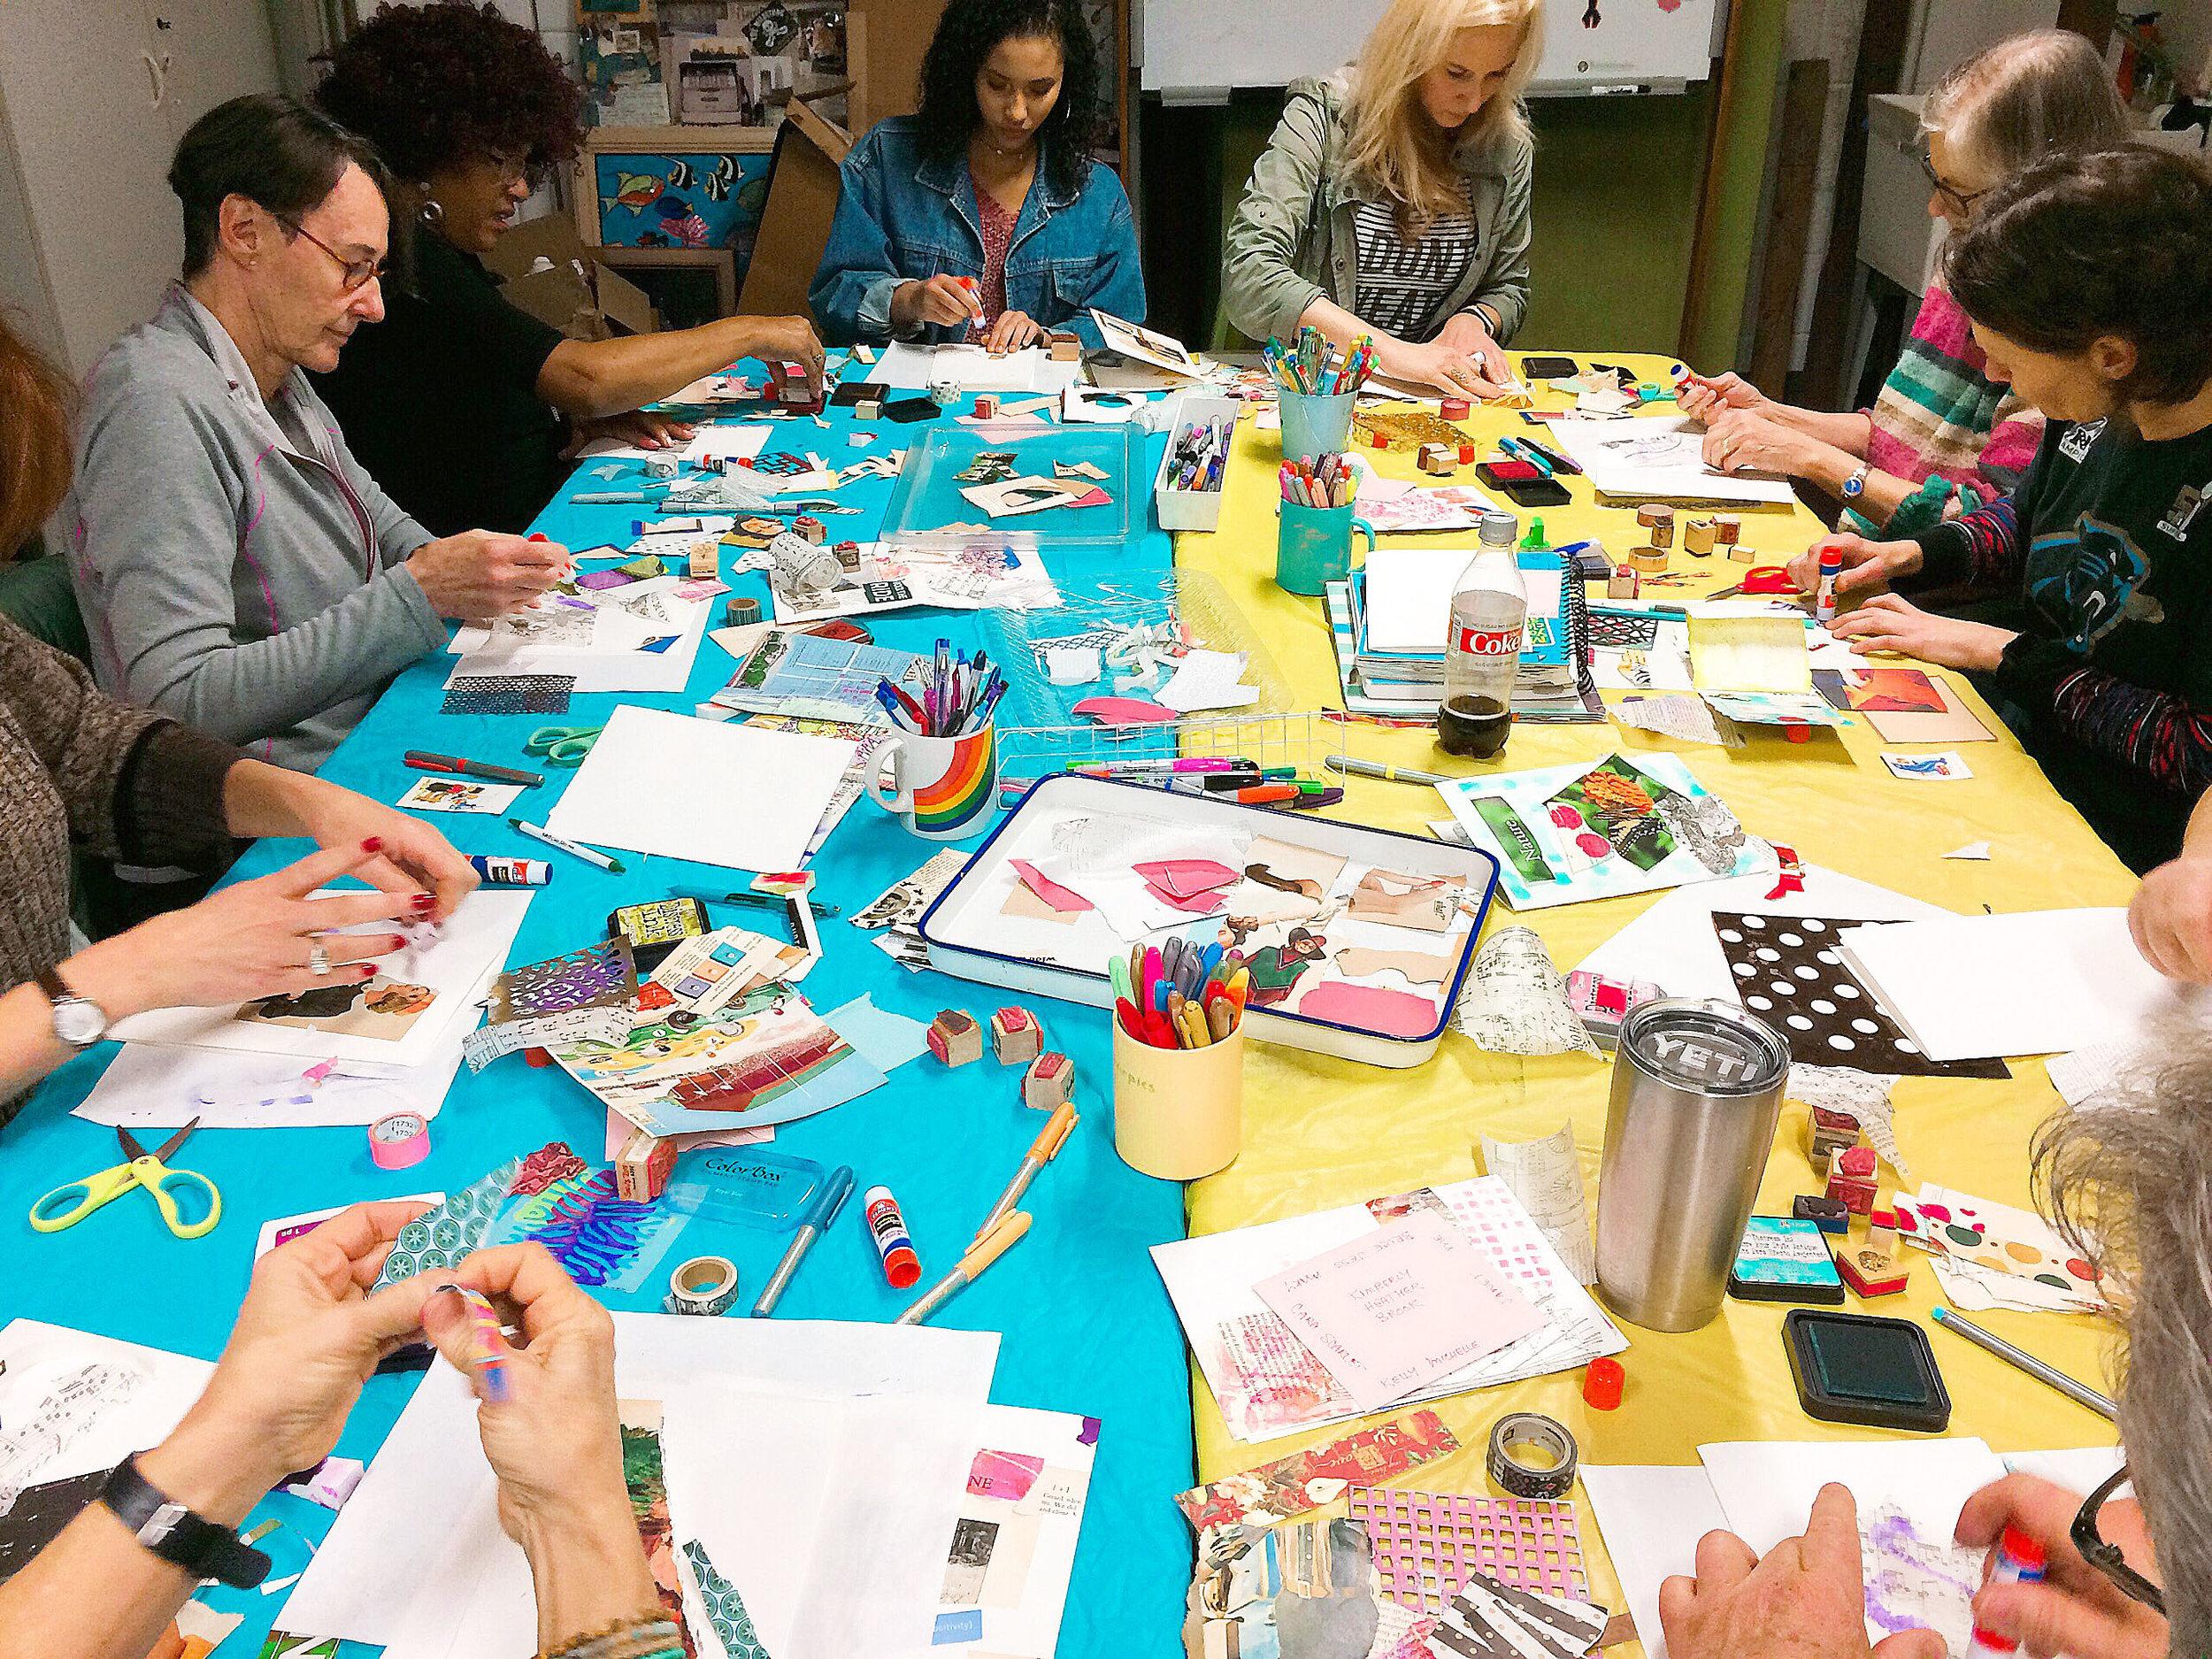 charlotte art league classroom.jpg